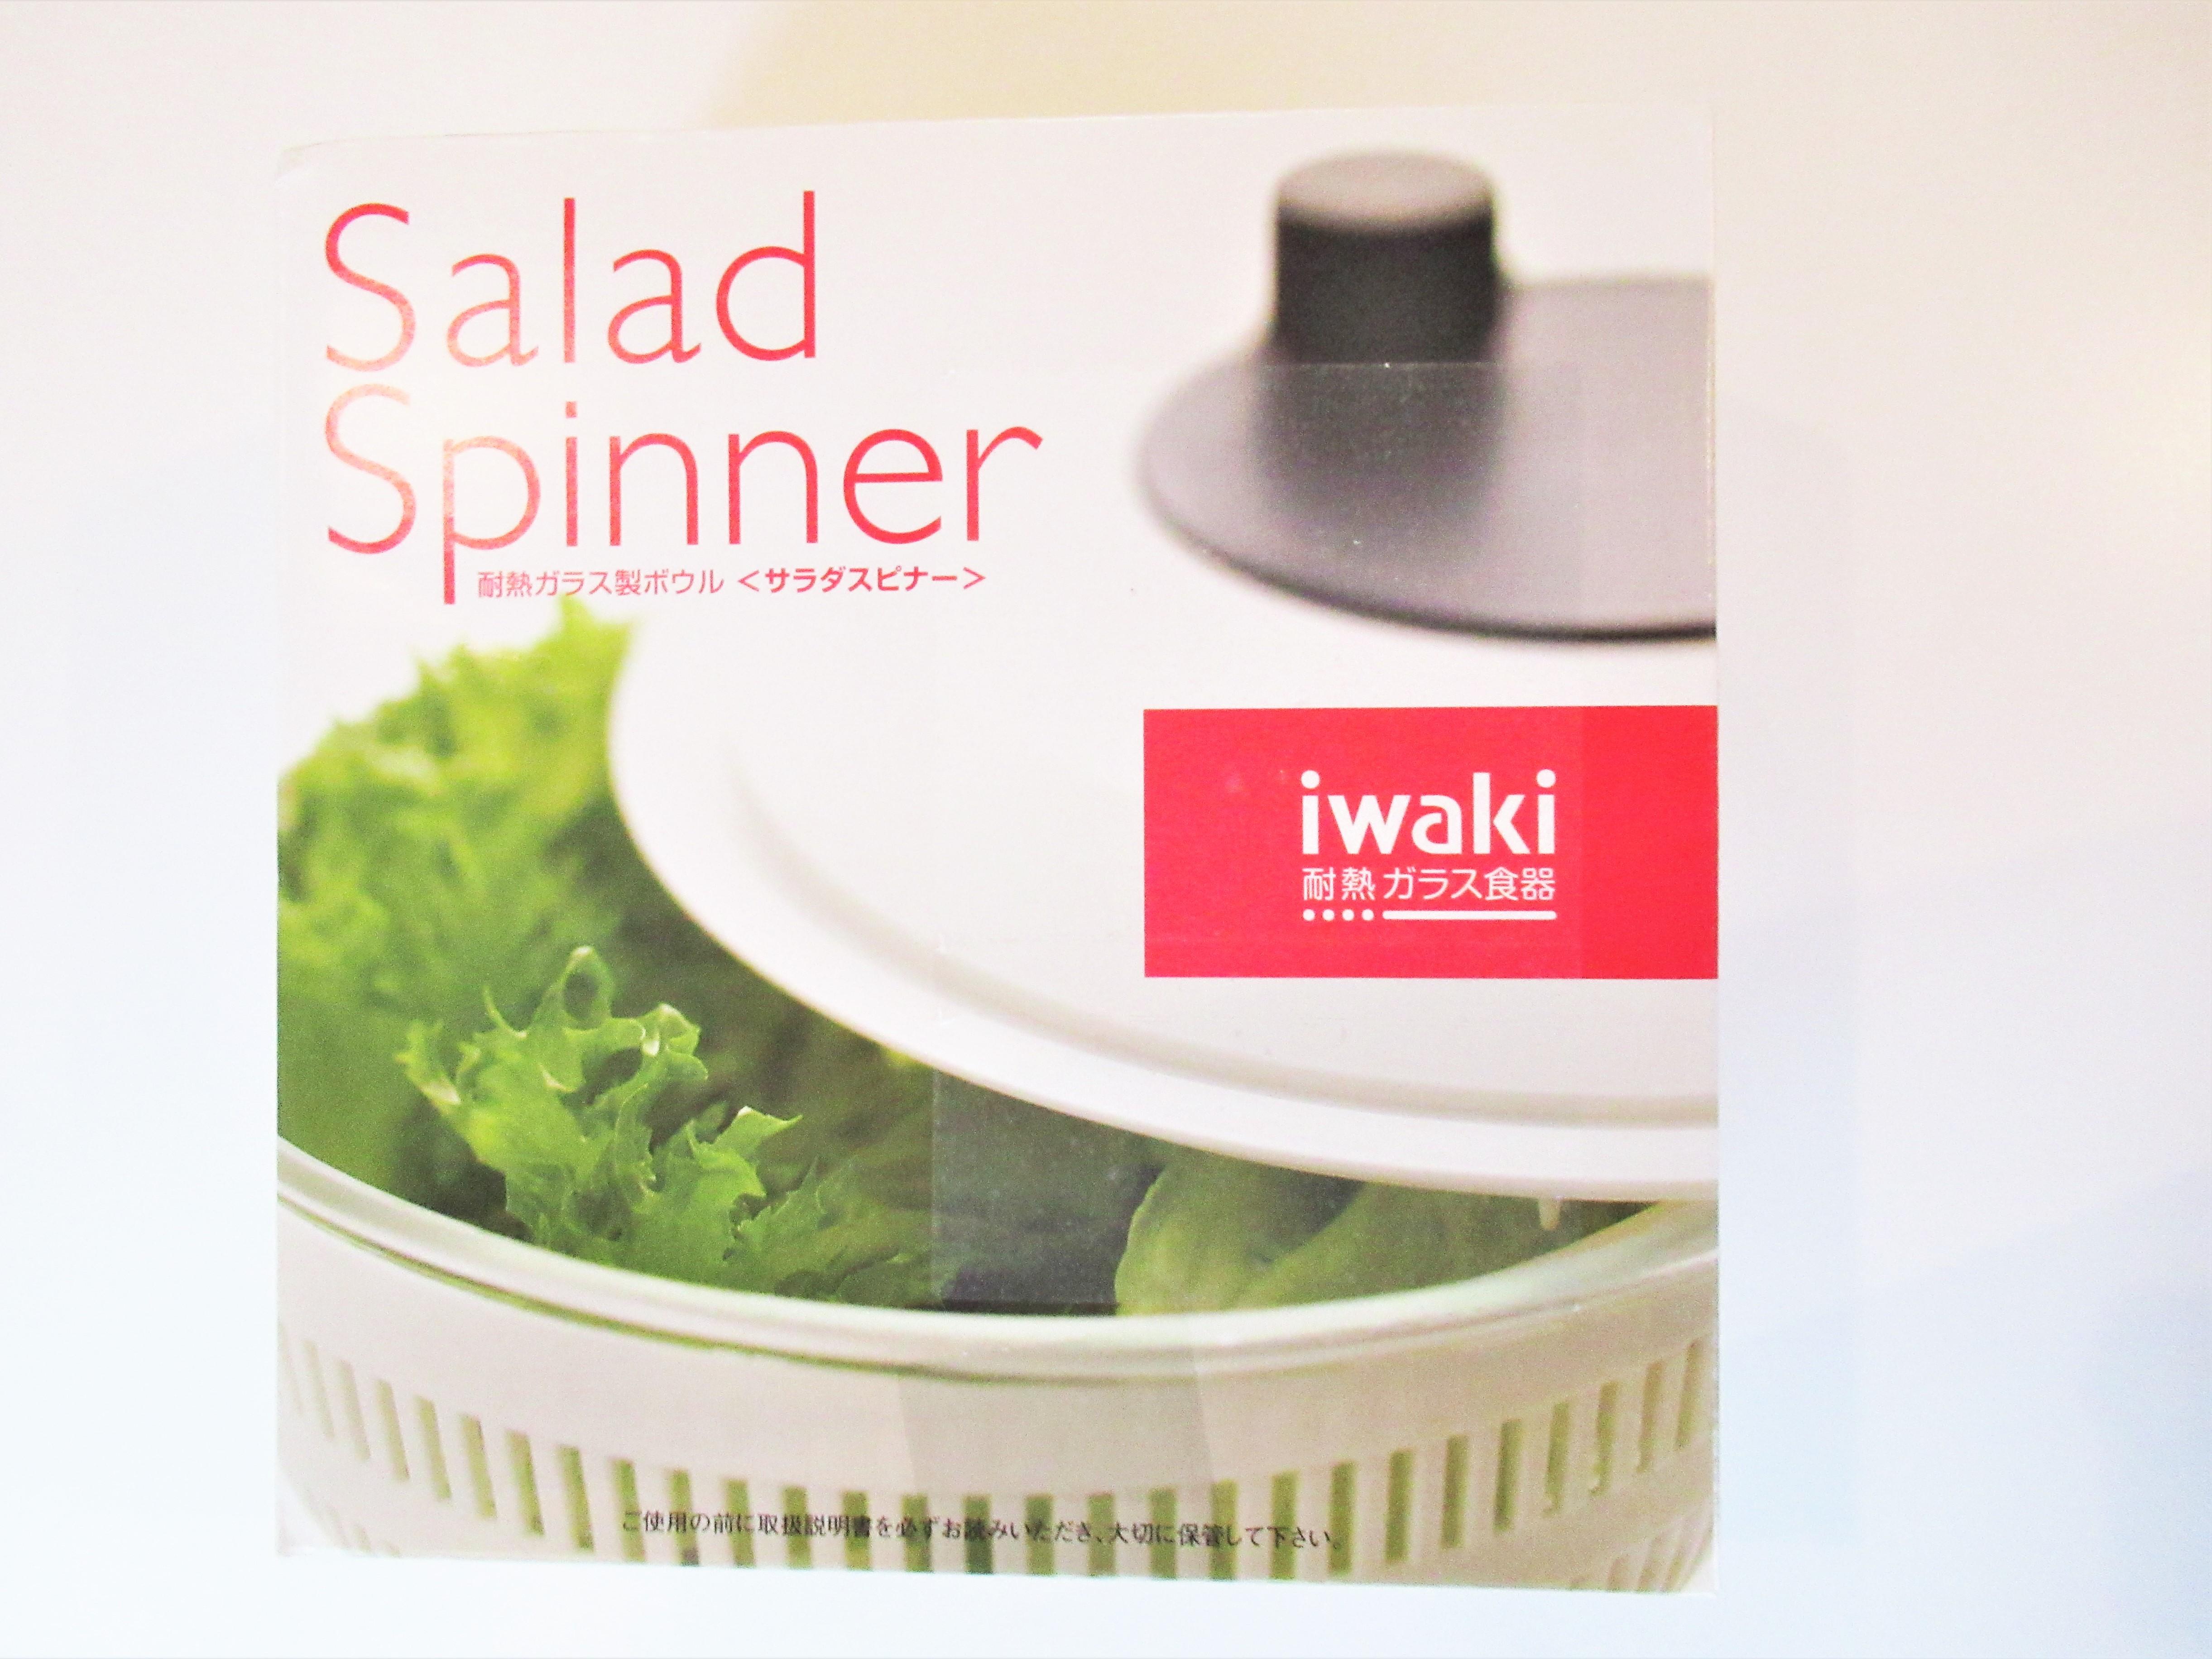 【iwaki】イワキのサラダスピナーで手軽にサラダ習慣|ラク家事ブログ